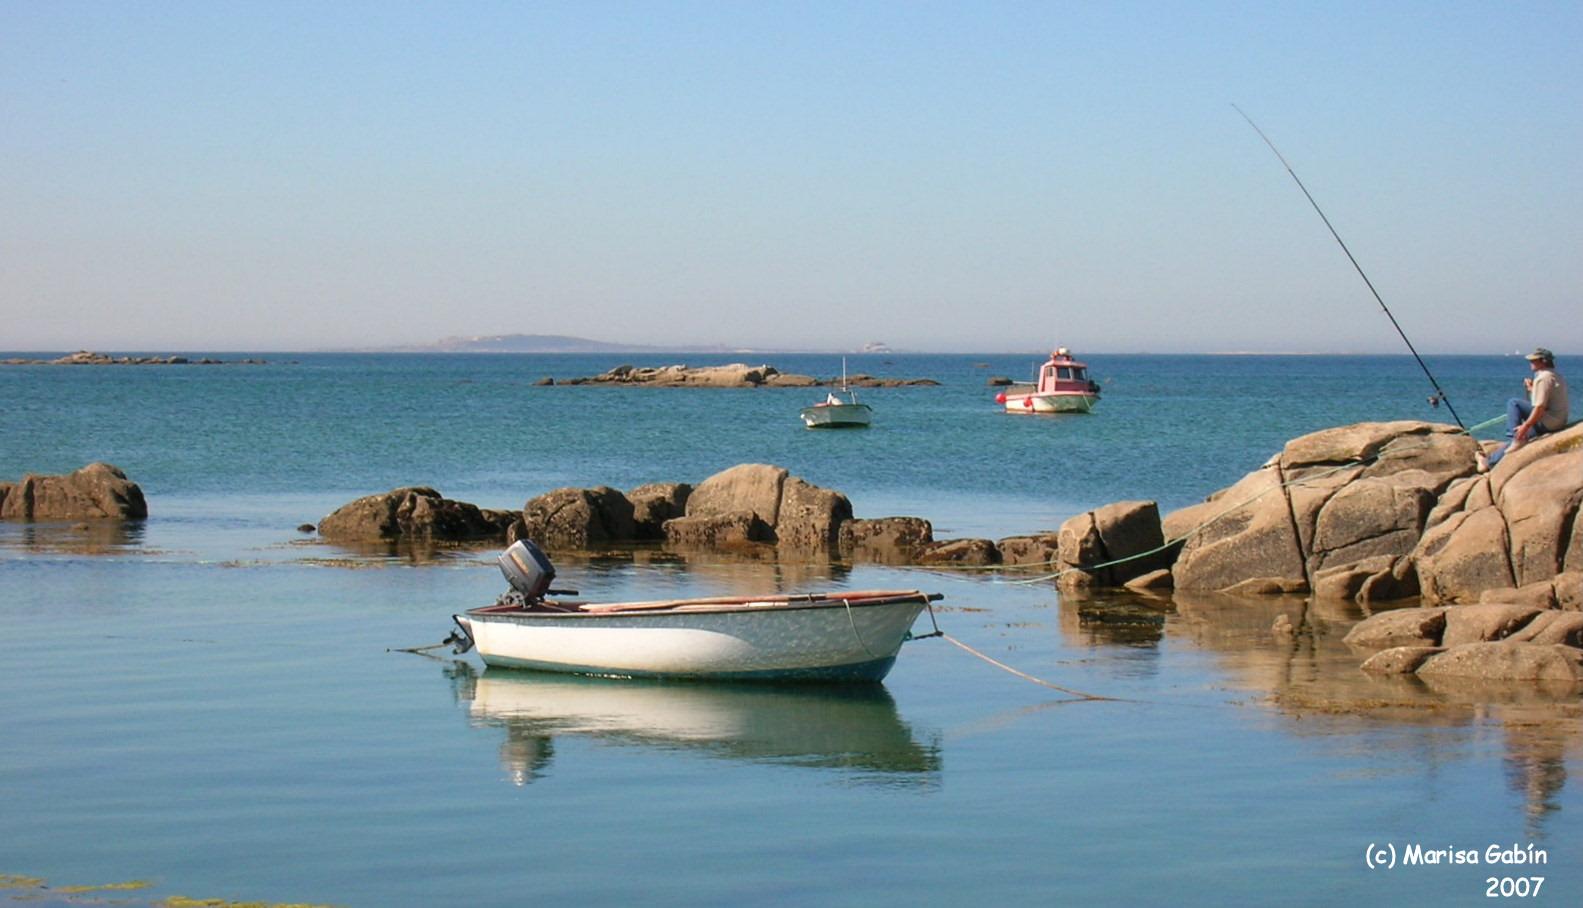 Foto playa Espiñeiro. (MG) Mar sereno, Isla de Arousa